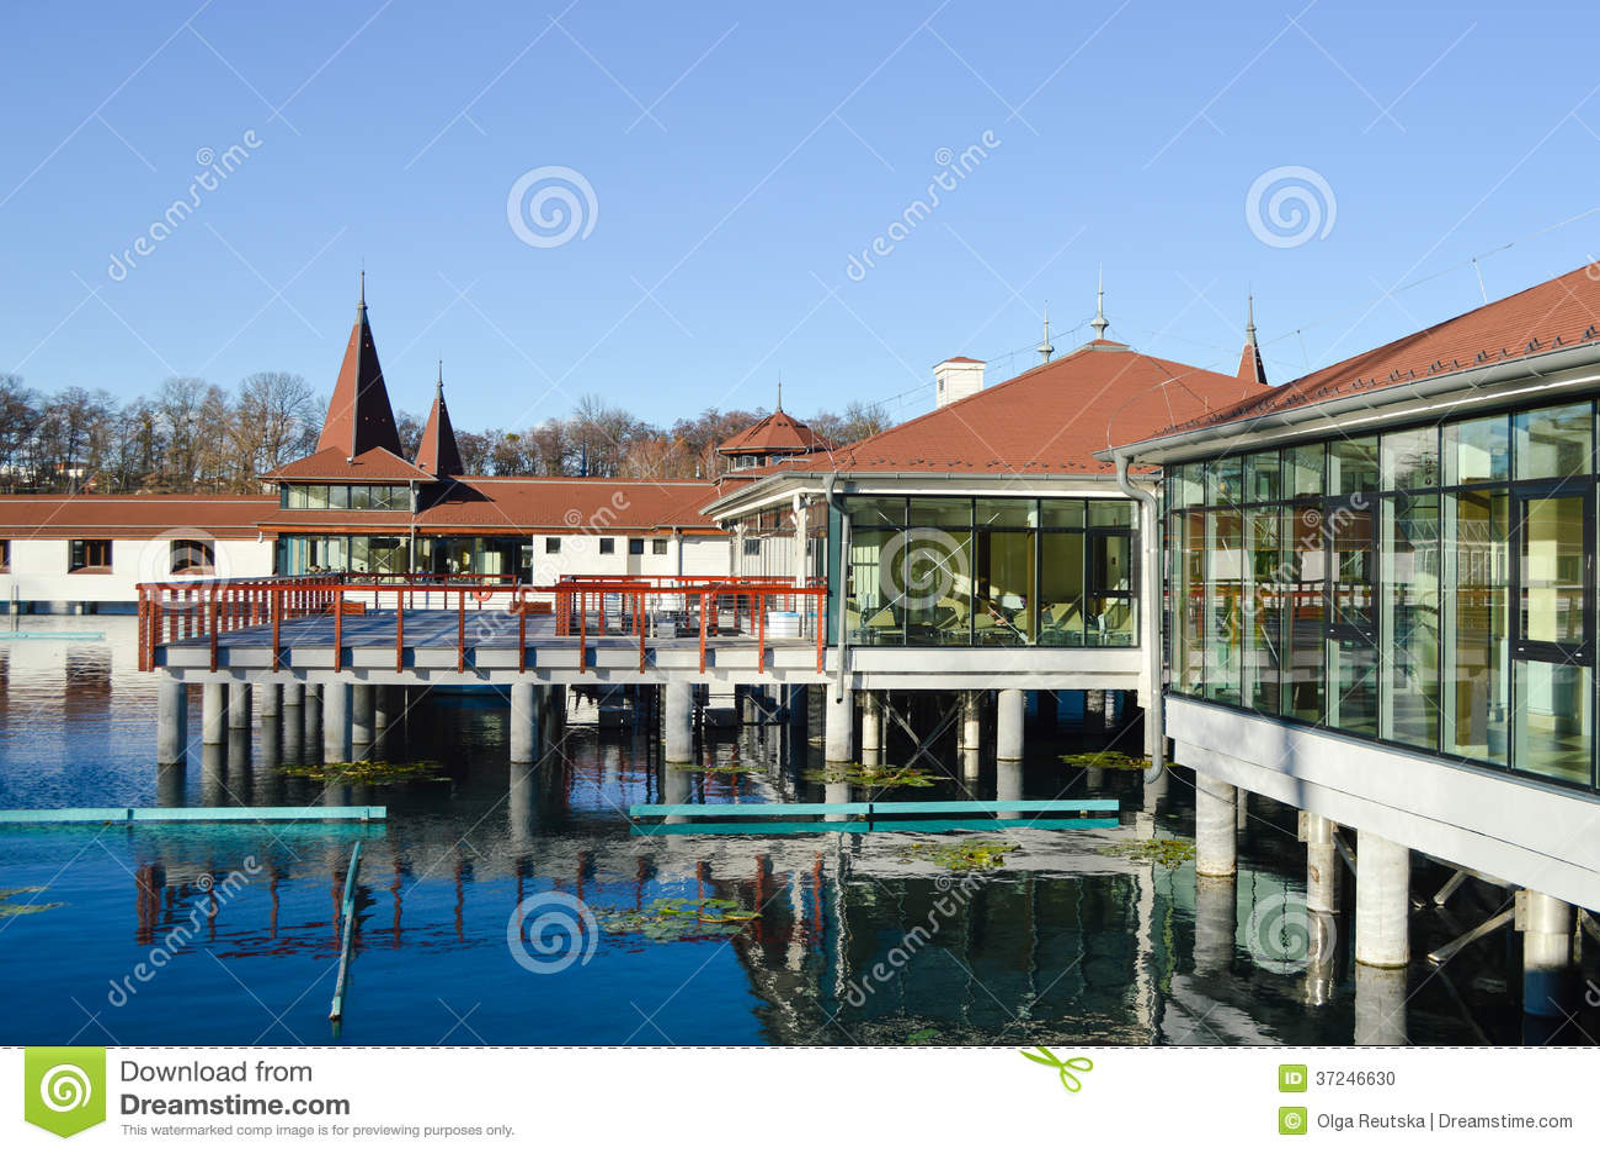 Time For Spa Heviz Thermal Lake And Swimming Pool Spa